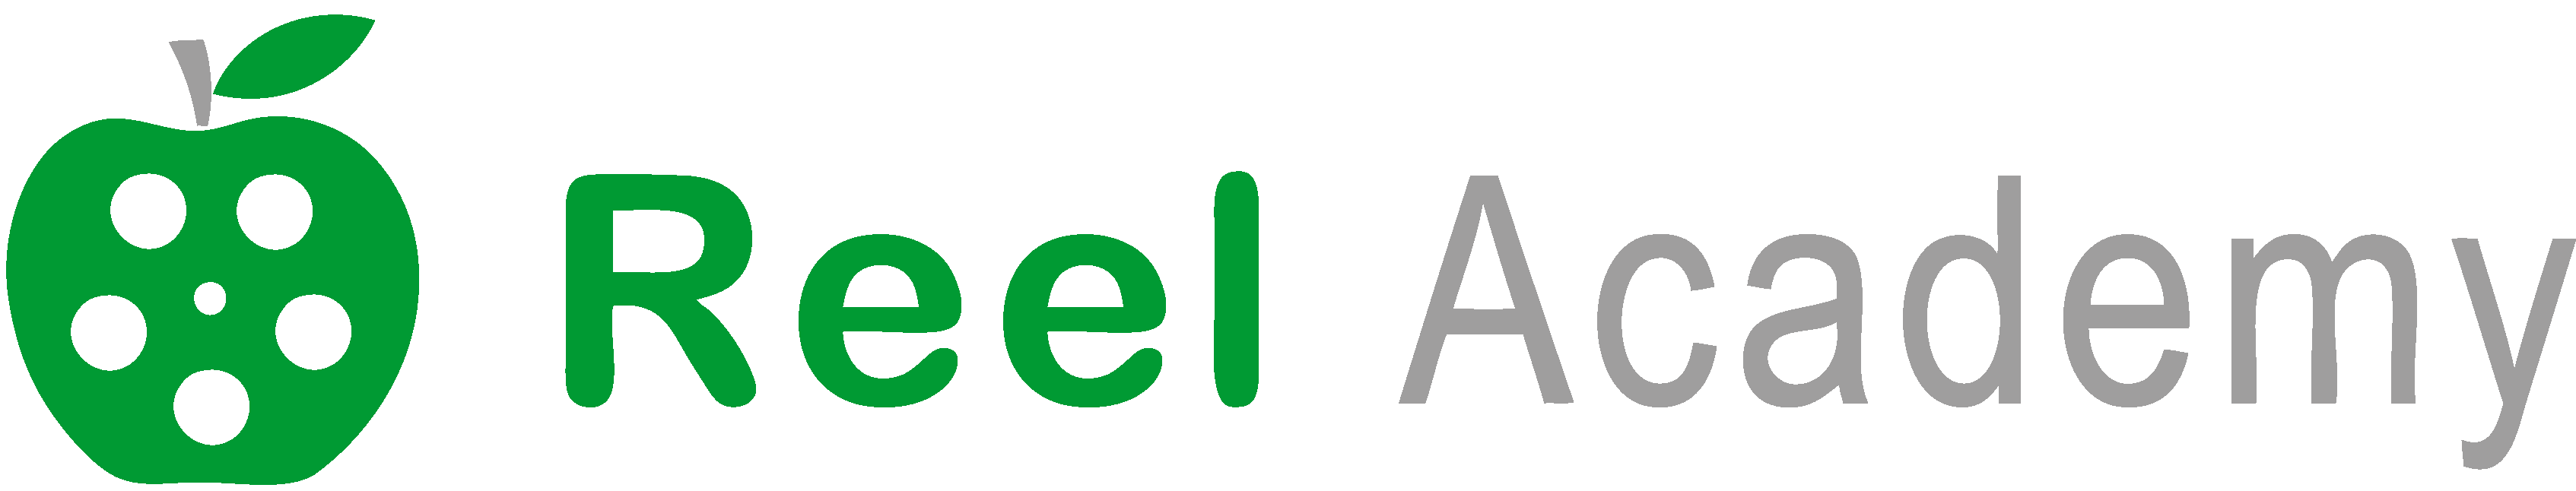 Reel Academy - SmarterU LMS - Learning Management System